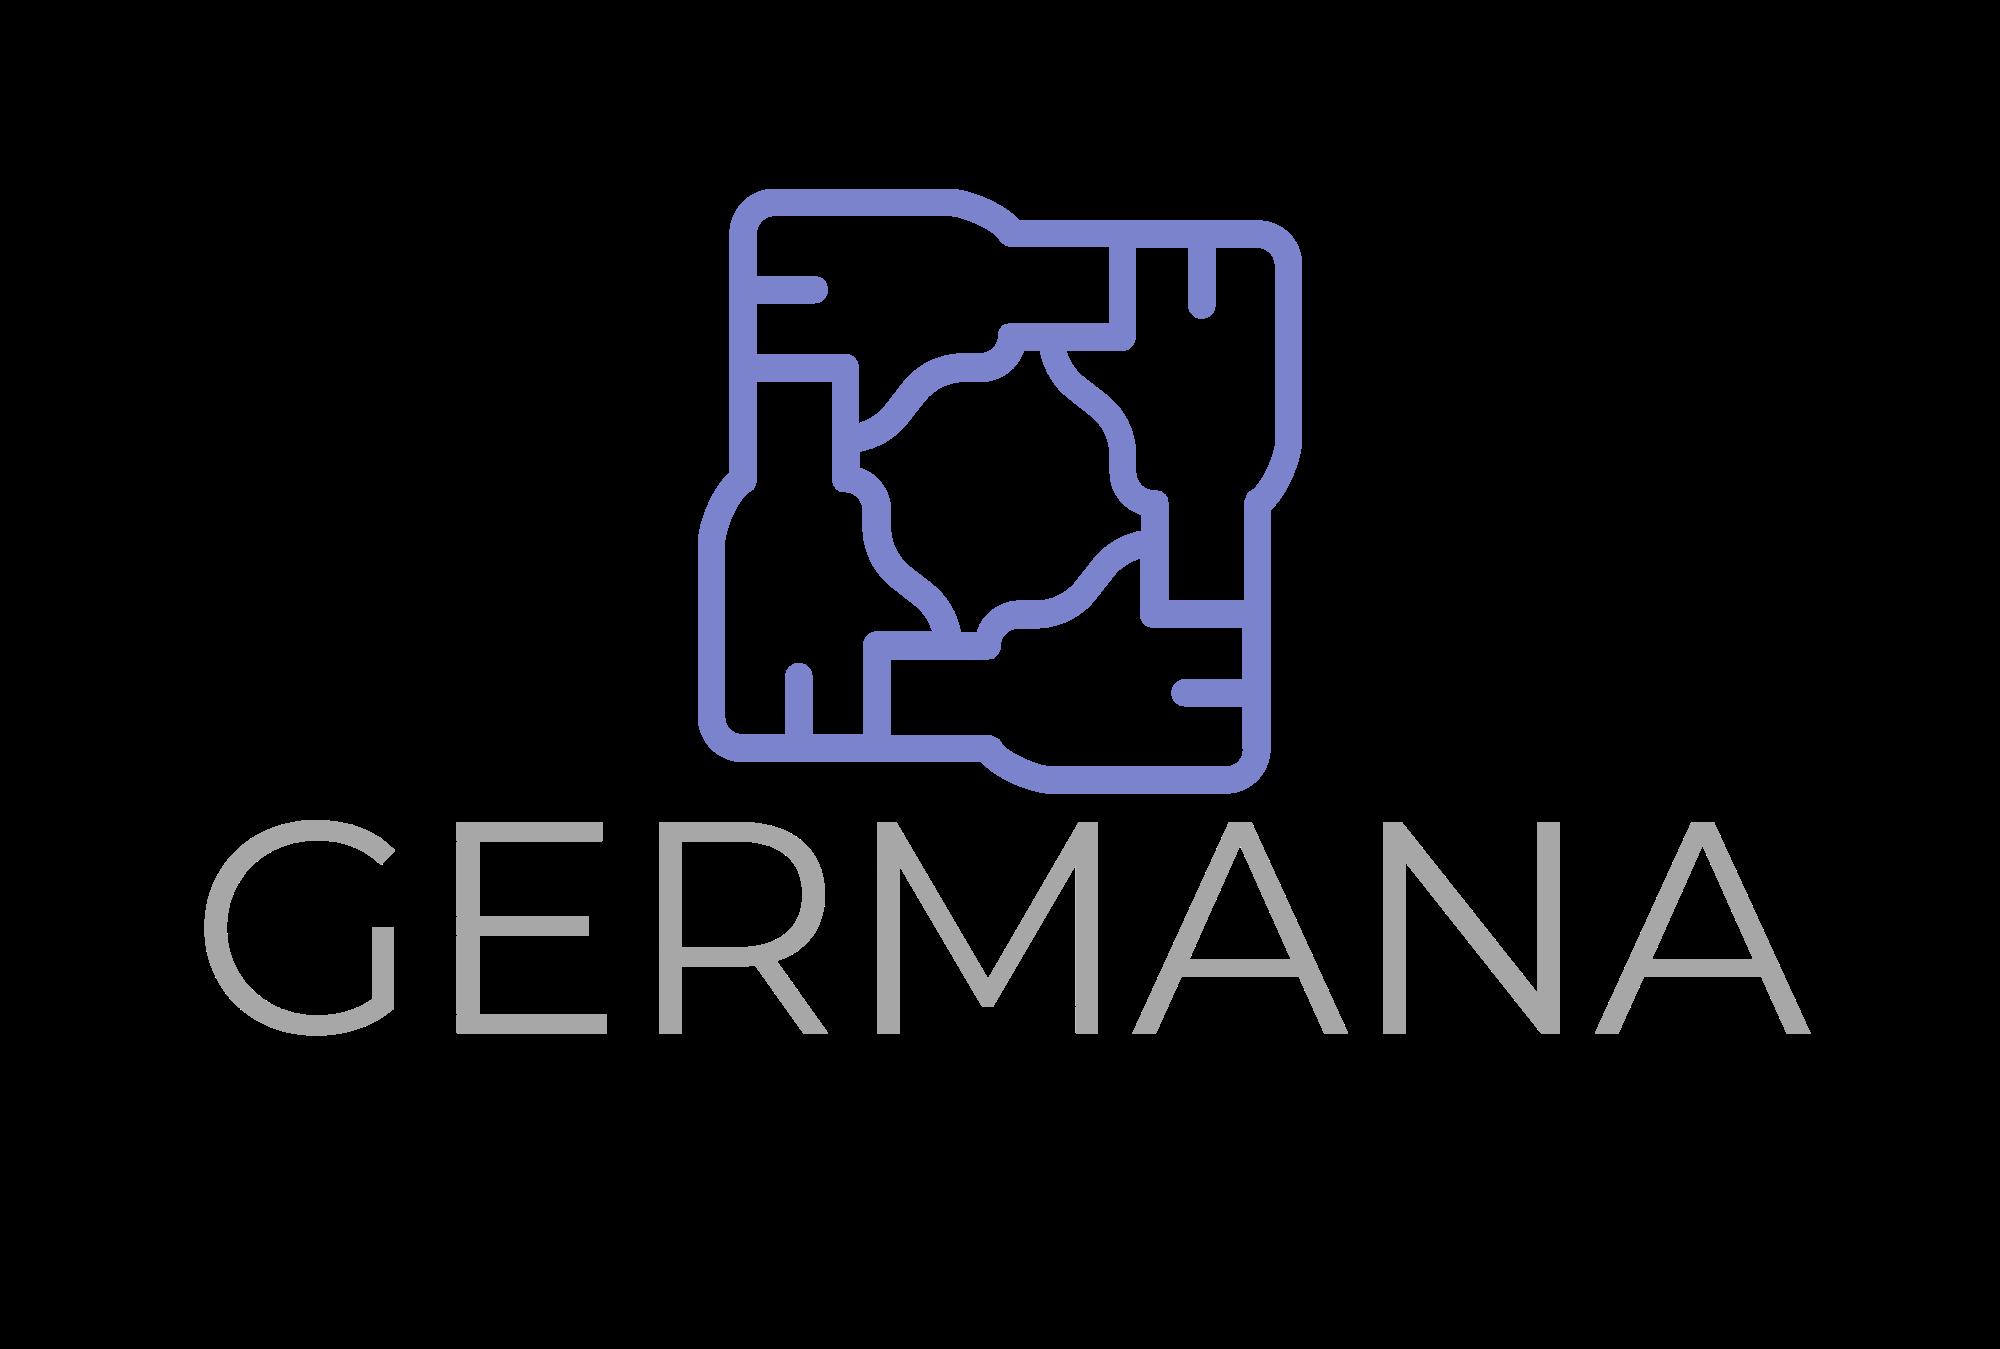 Copy of Copy of GERMANA